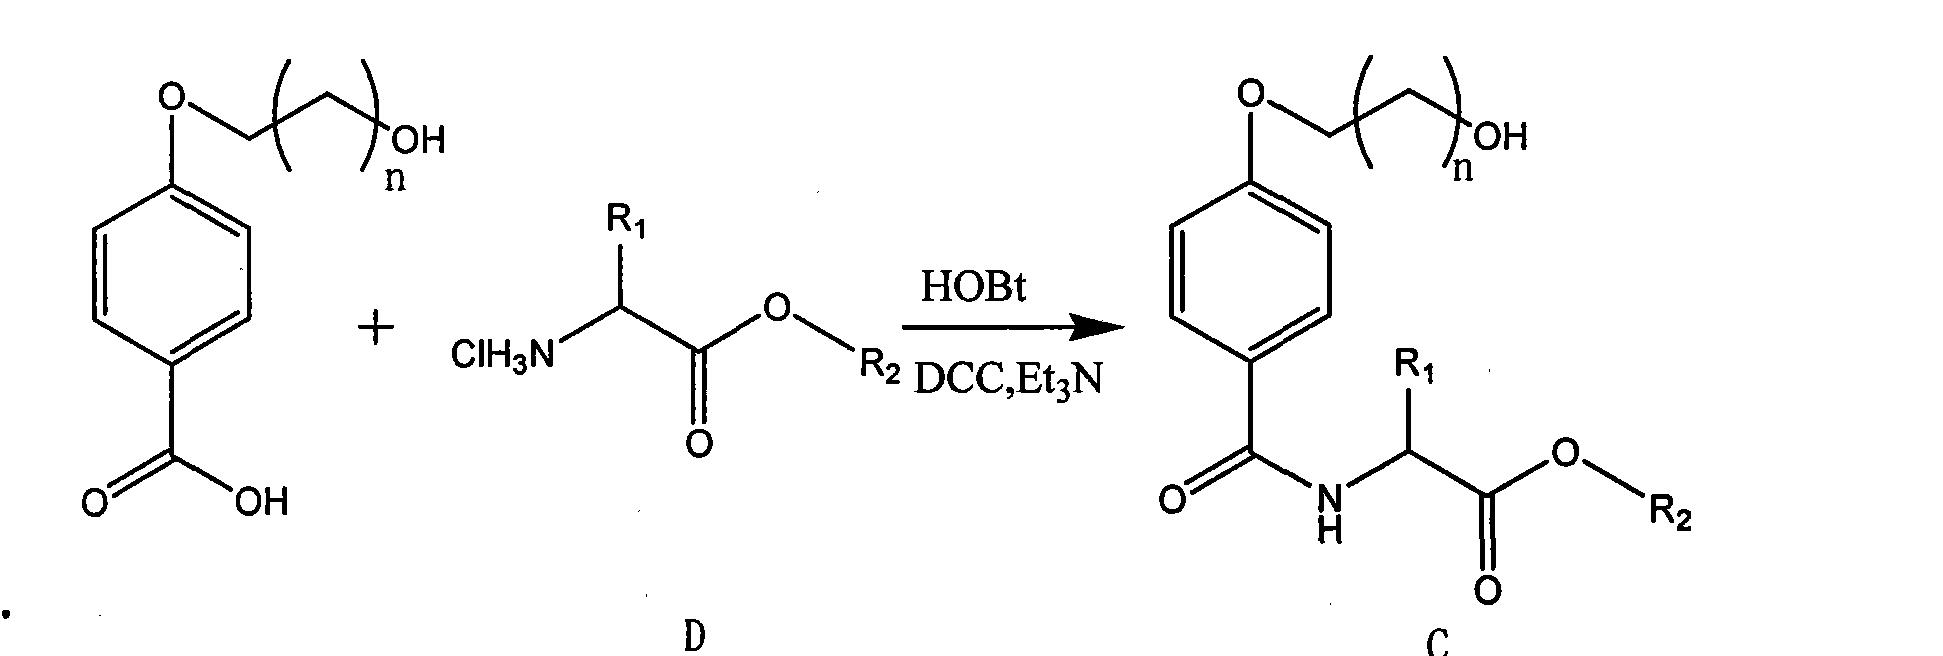 Patent CN101723849B - Novel 18F labeled amino acid derivatives, preparation method and